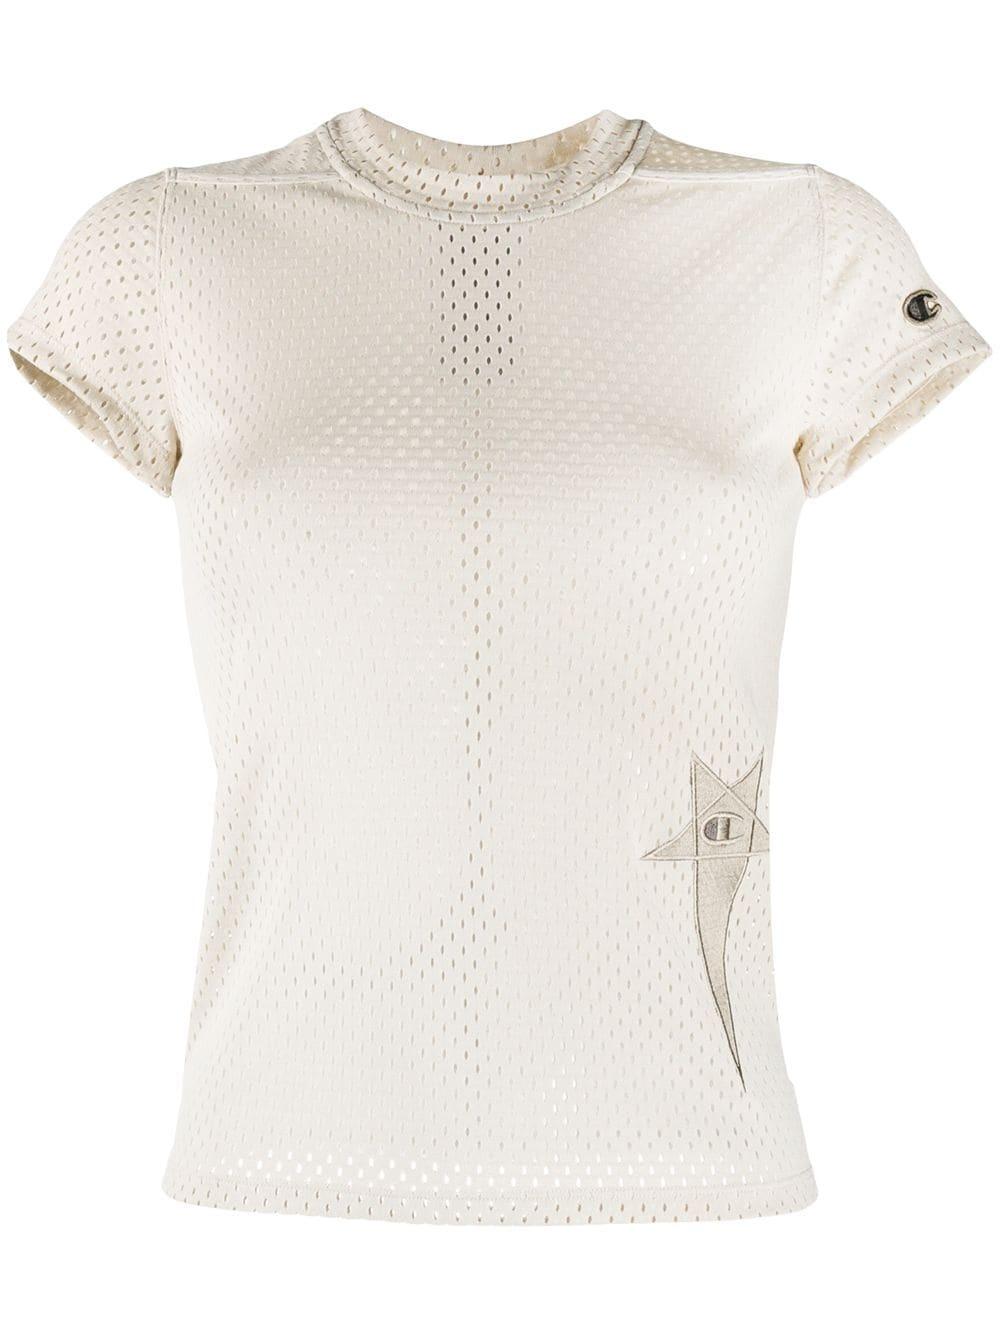 T-shirt - Mesh - Pearl - XS-1